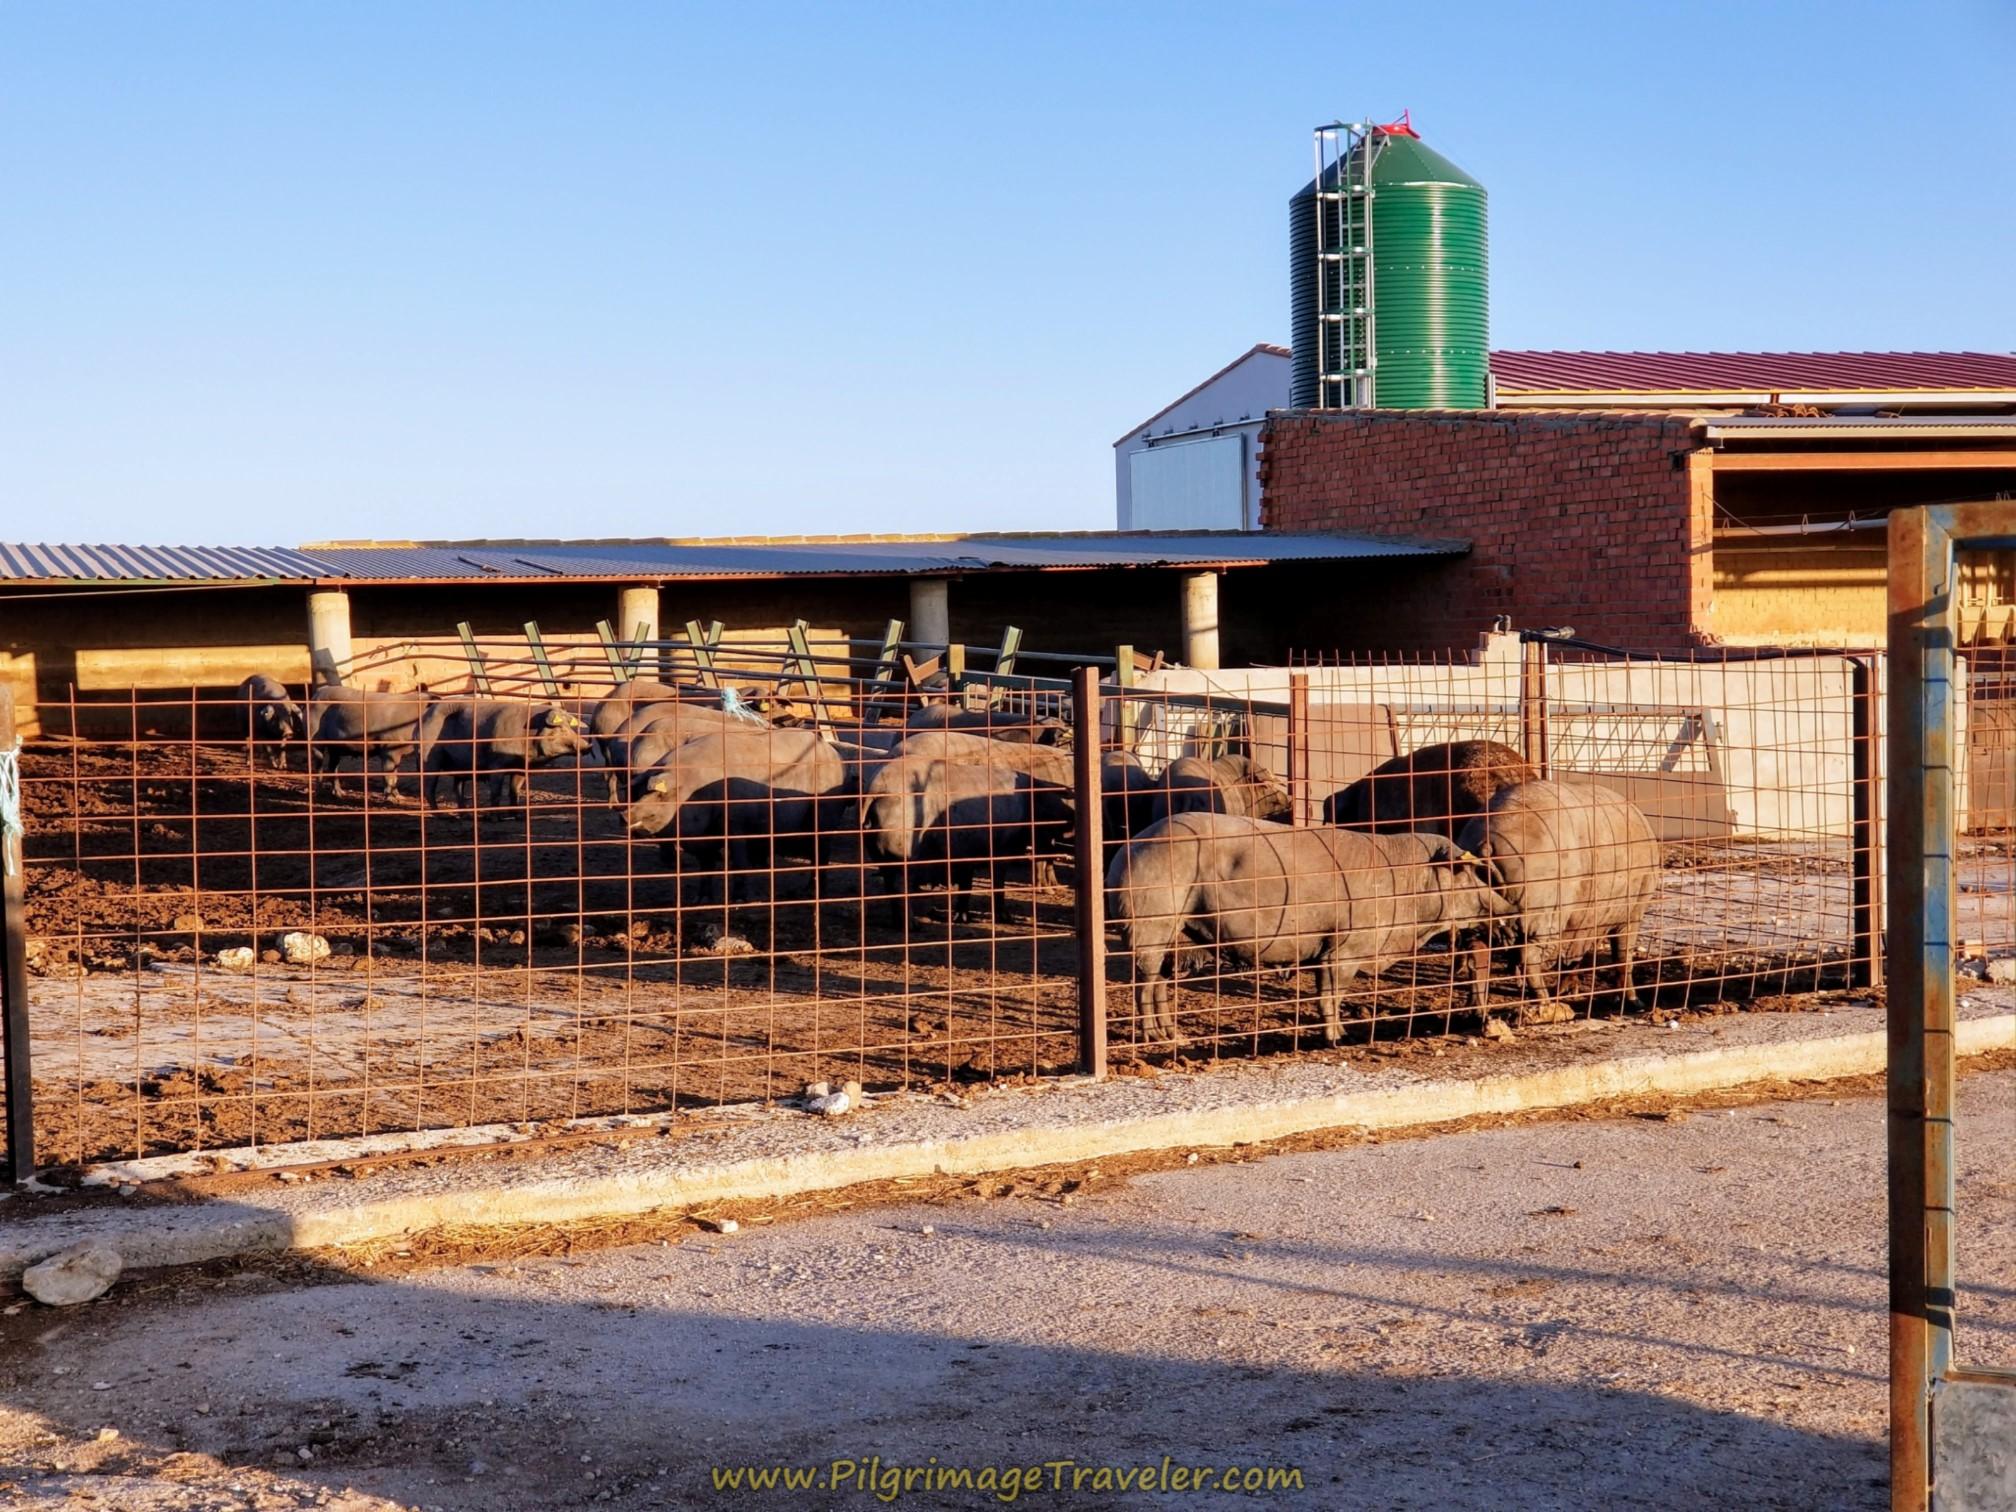 It's a Pig Farm